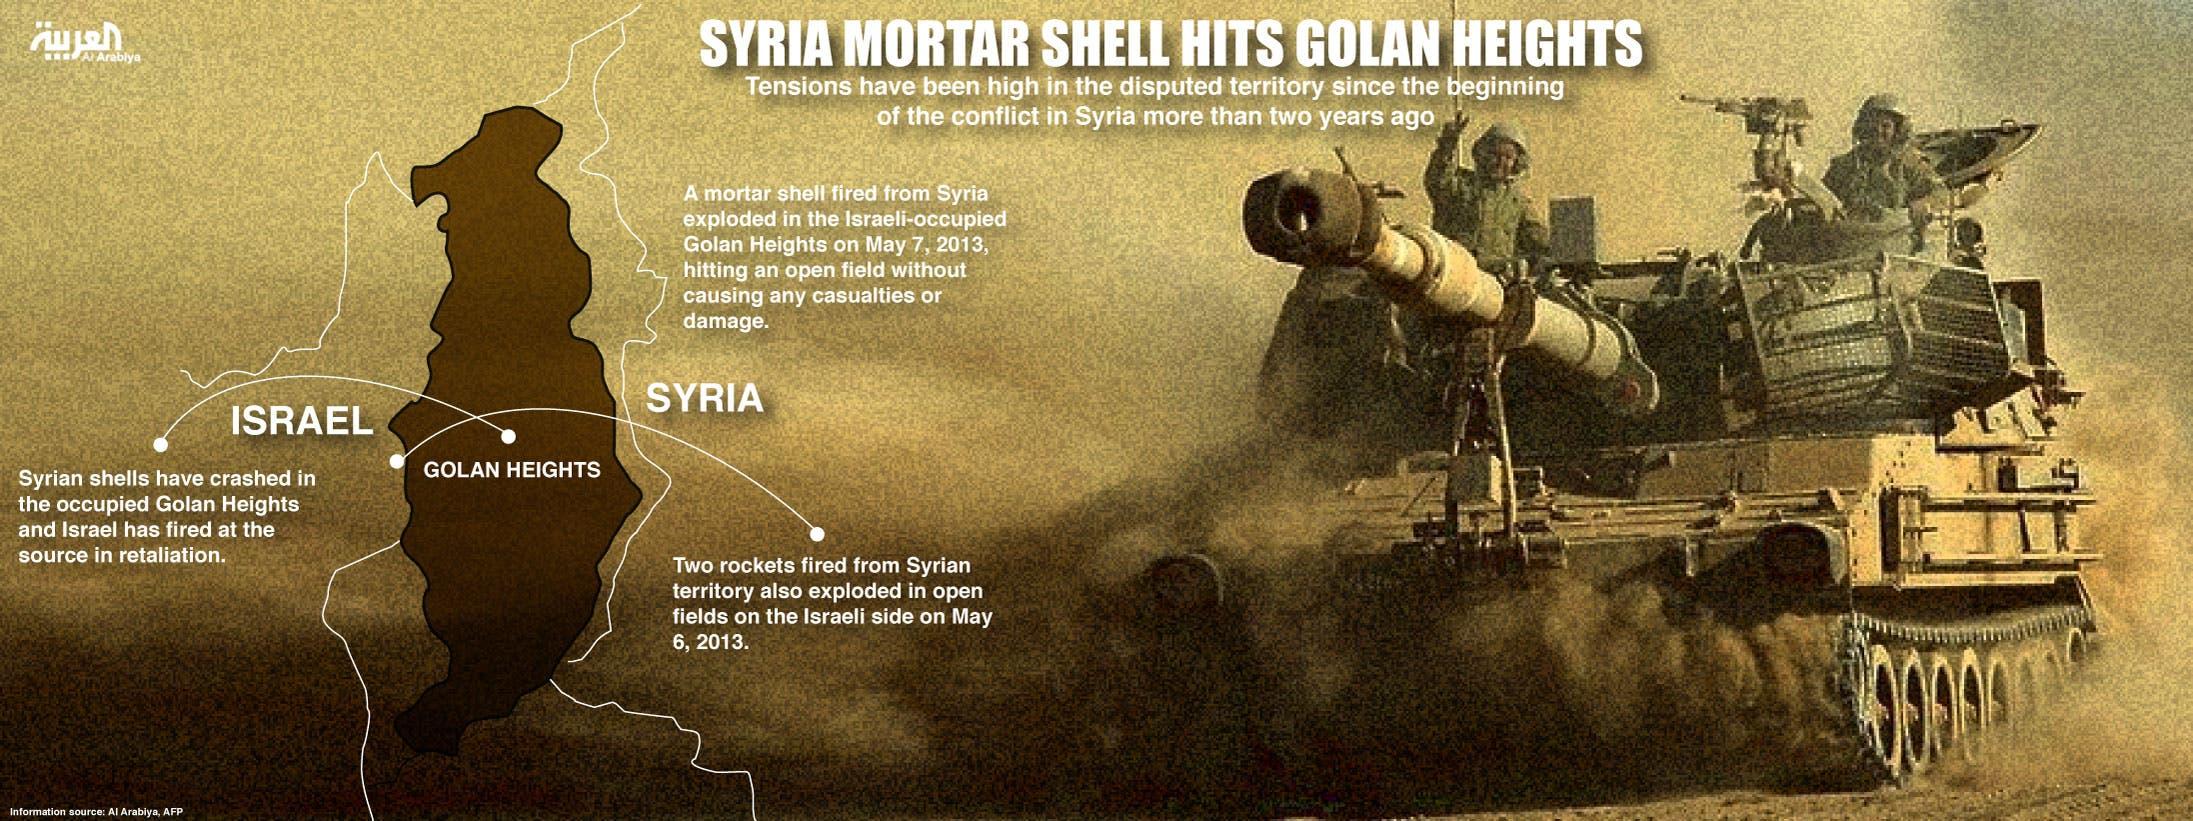 info graphic: Syria mortar shell hits Golan Heights (Design by Farwa Rizwan / Al Arabiya English)